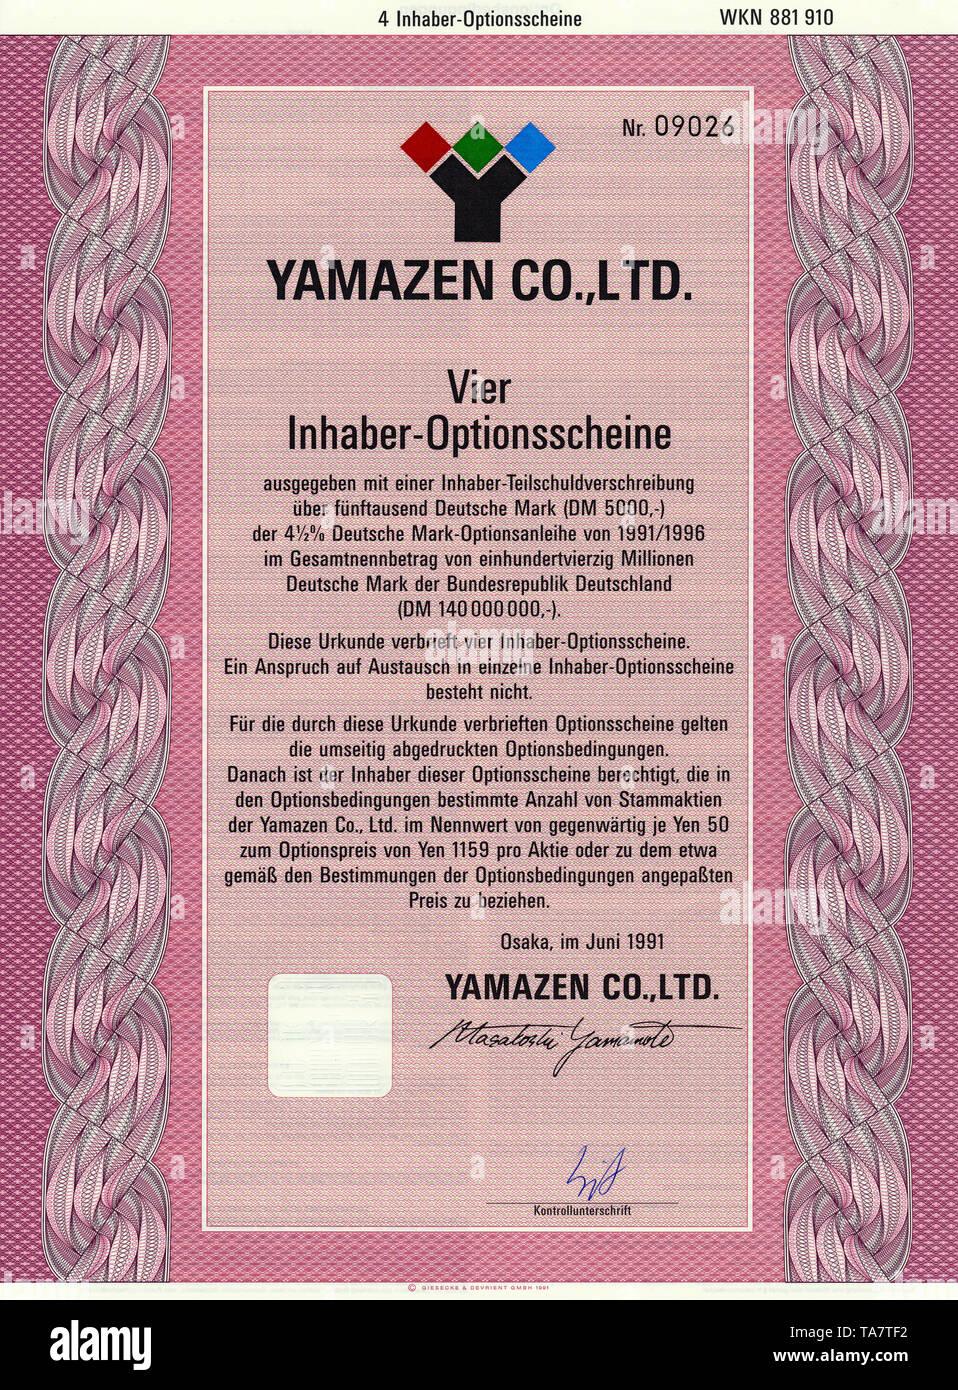 Historic stock certificate, Securities certificate, bearer warrant, mechanical engineering, Historisches Wertpapier, japanischer Inhaber-Optionsschein, Maschinenbau, Yamazen Co. Ltd., 1991, Osaka, Japan - Stock Image